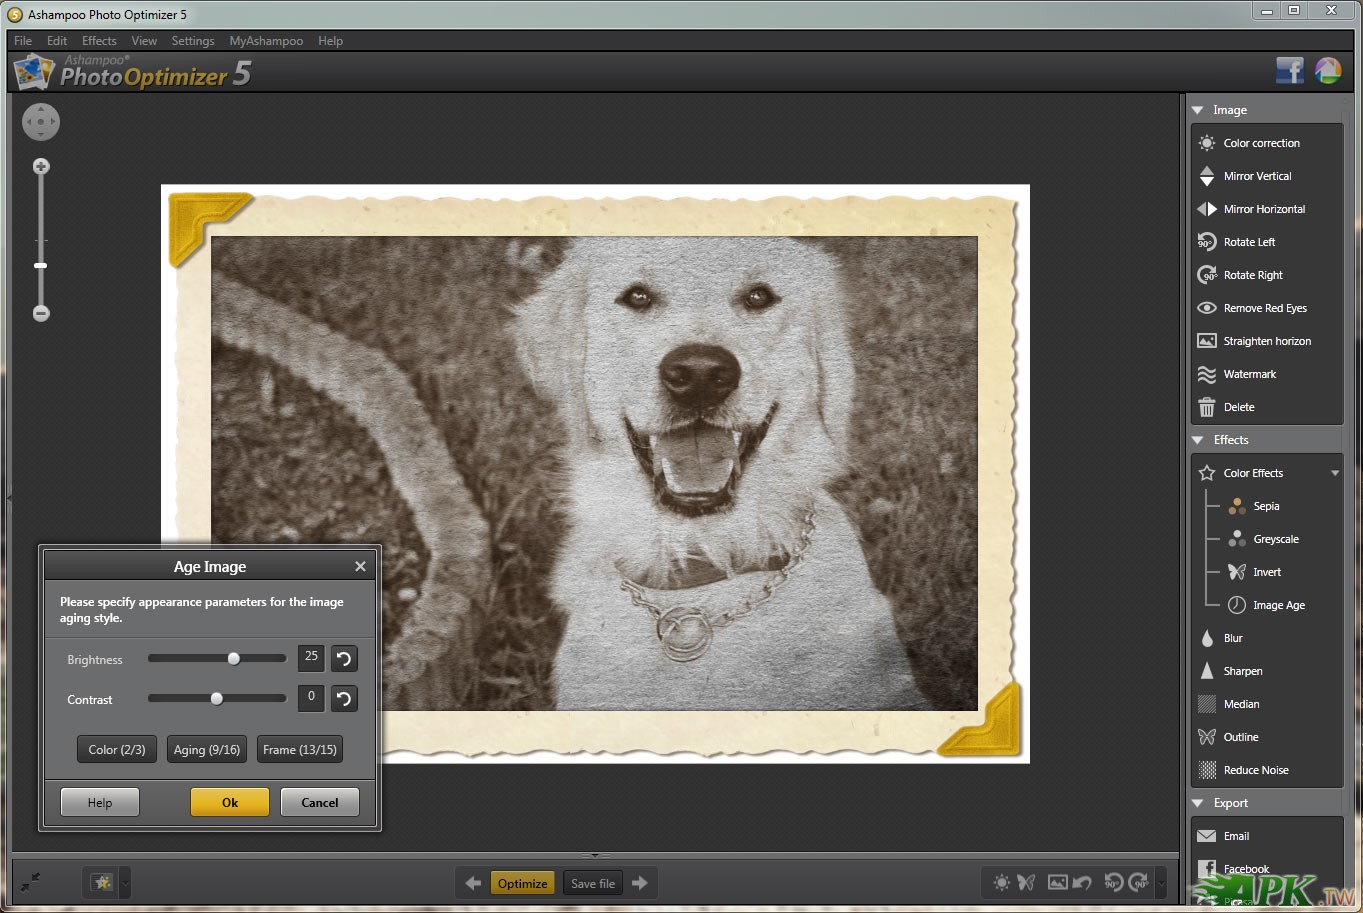 scr_ashampoo_photo_optimizer_5_en_age_image.jpg